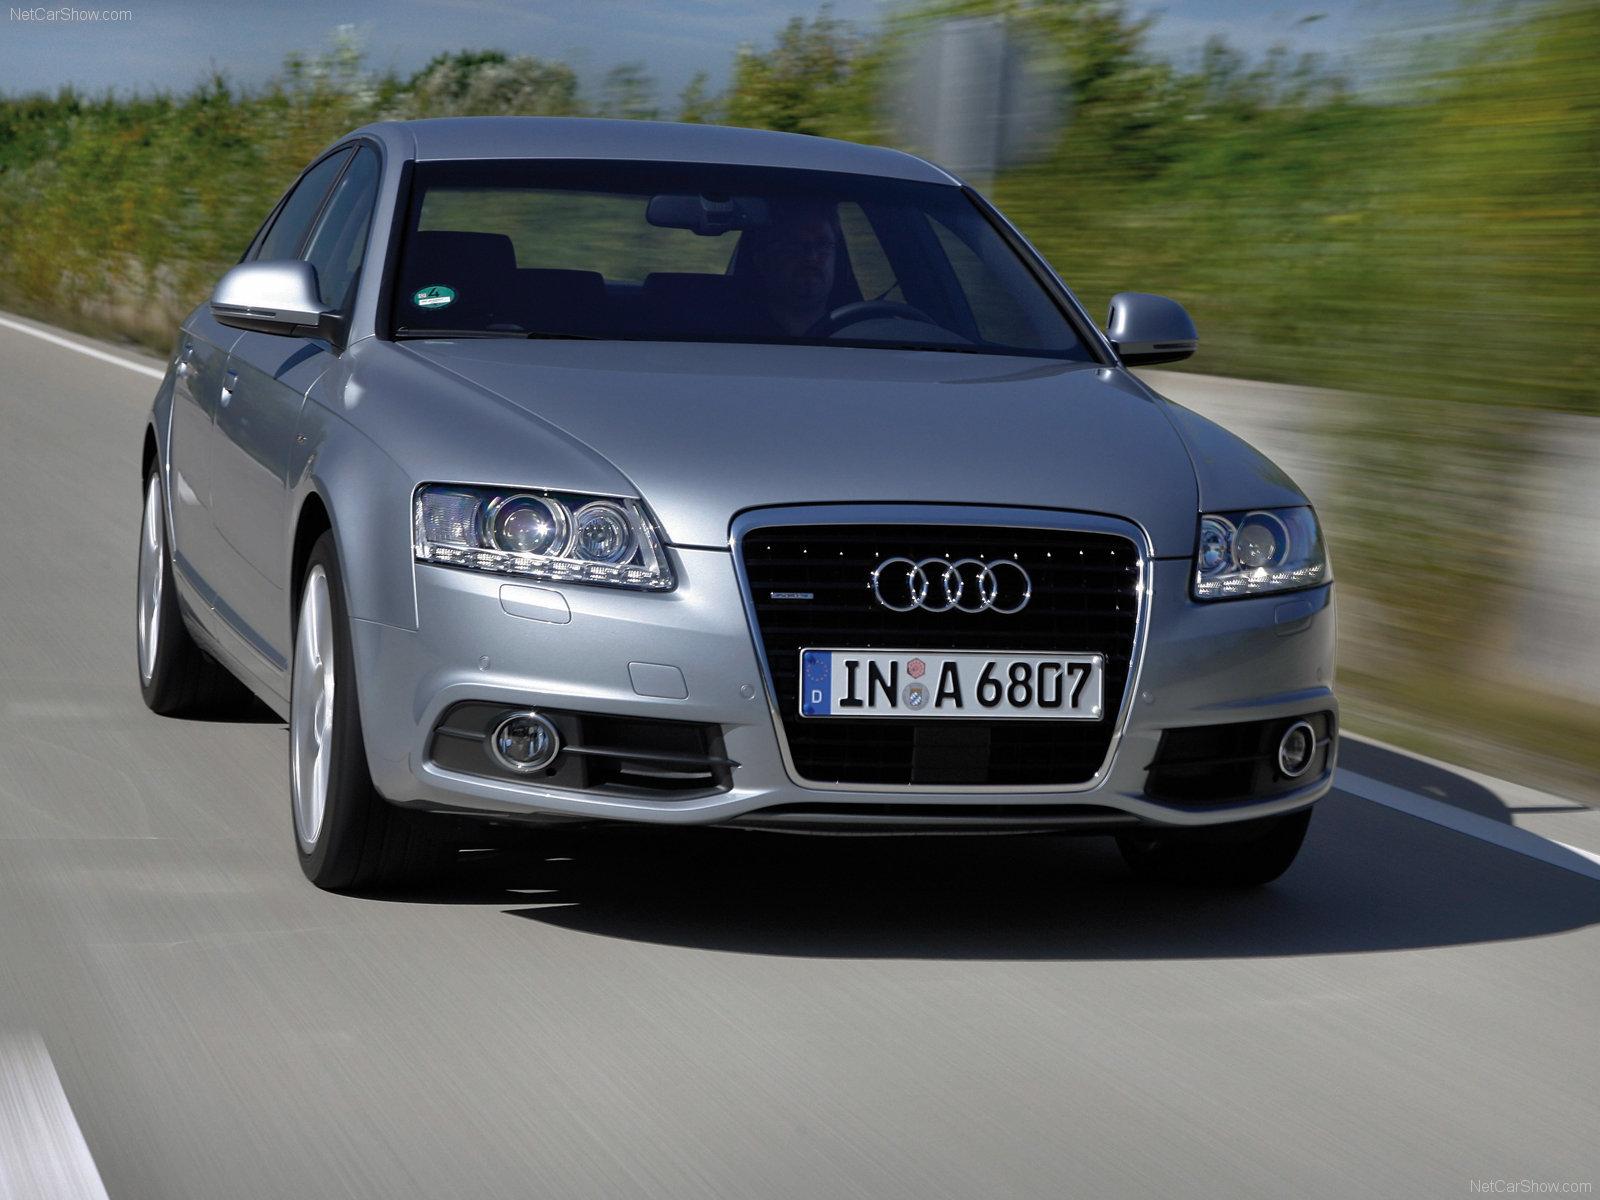 3dtuning Of Audi A6 Sedan 2009 3dtuning Com Unique On